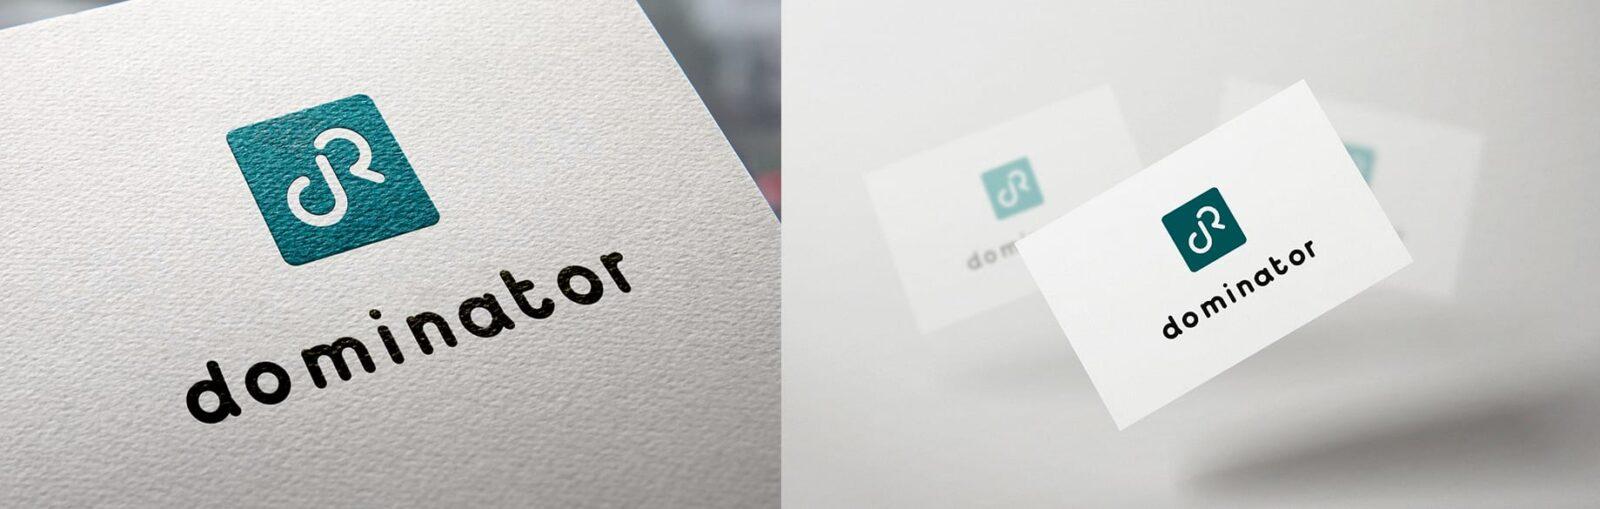 разработка логотипа в одессе